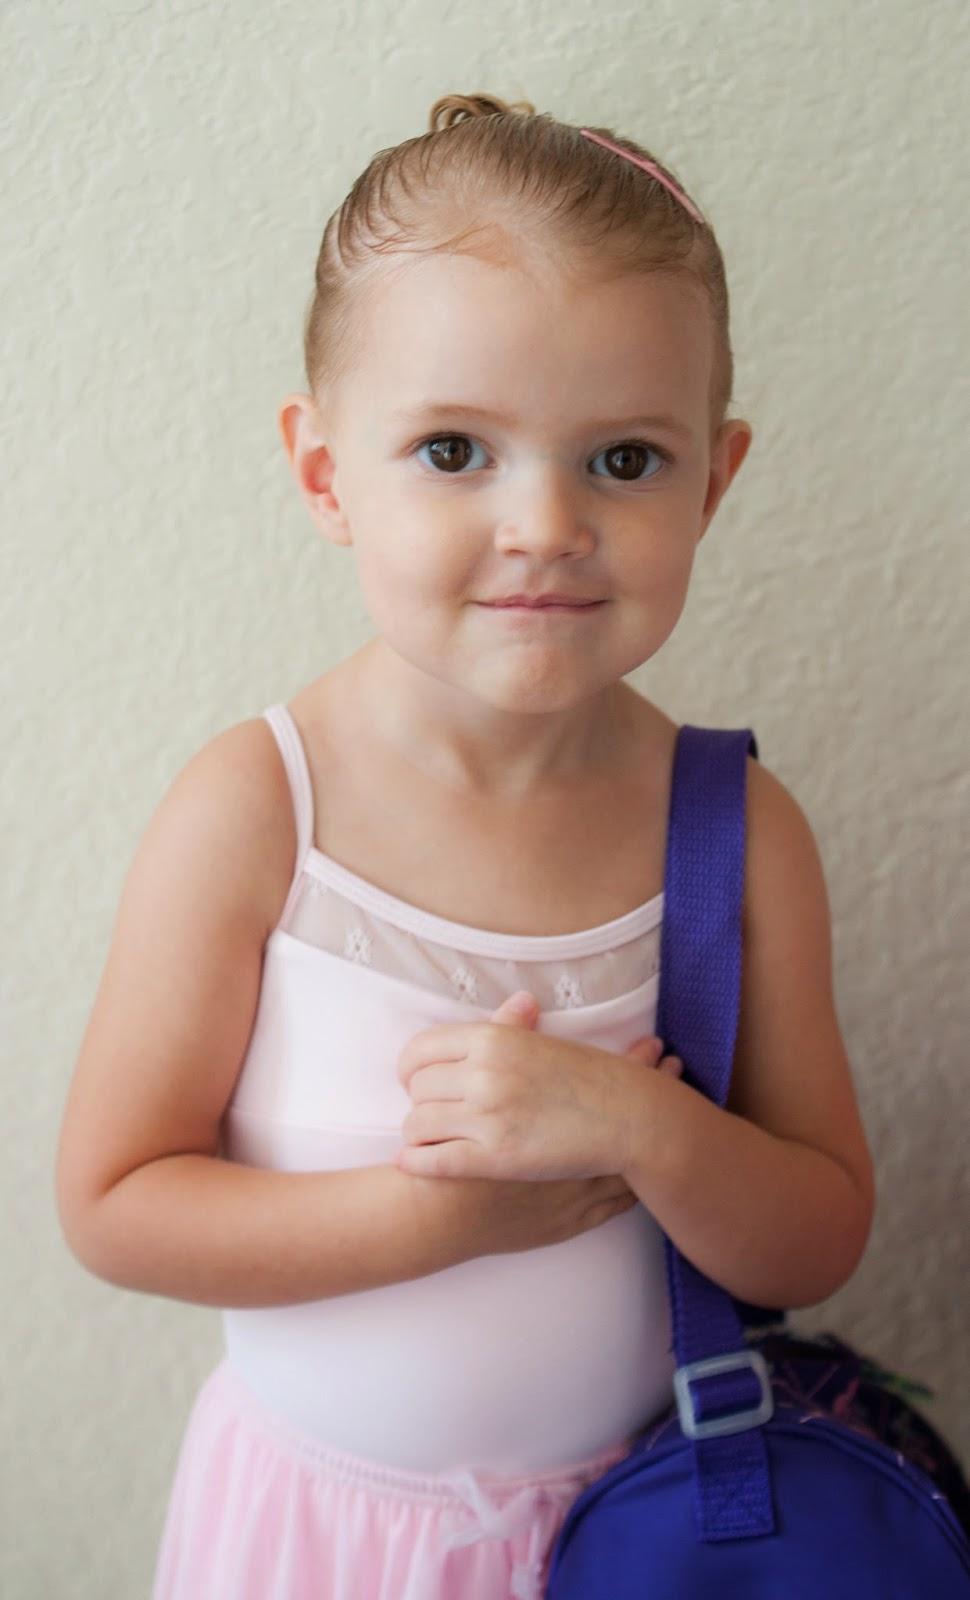 The Sweatman Family: Scarlett's 1st Day of Ballet Class